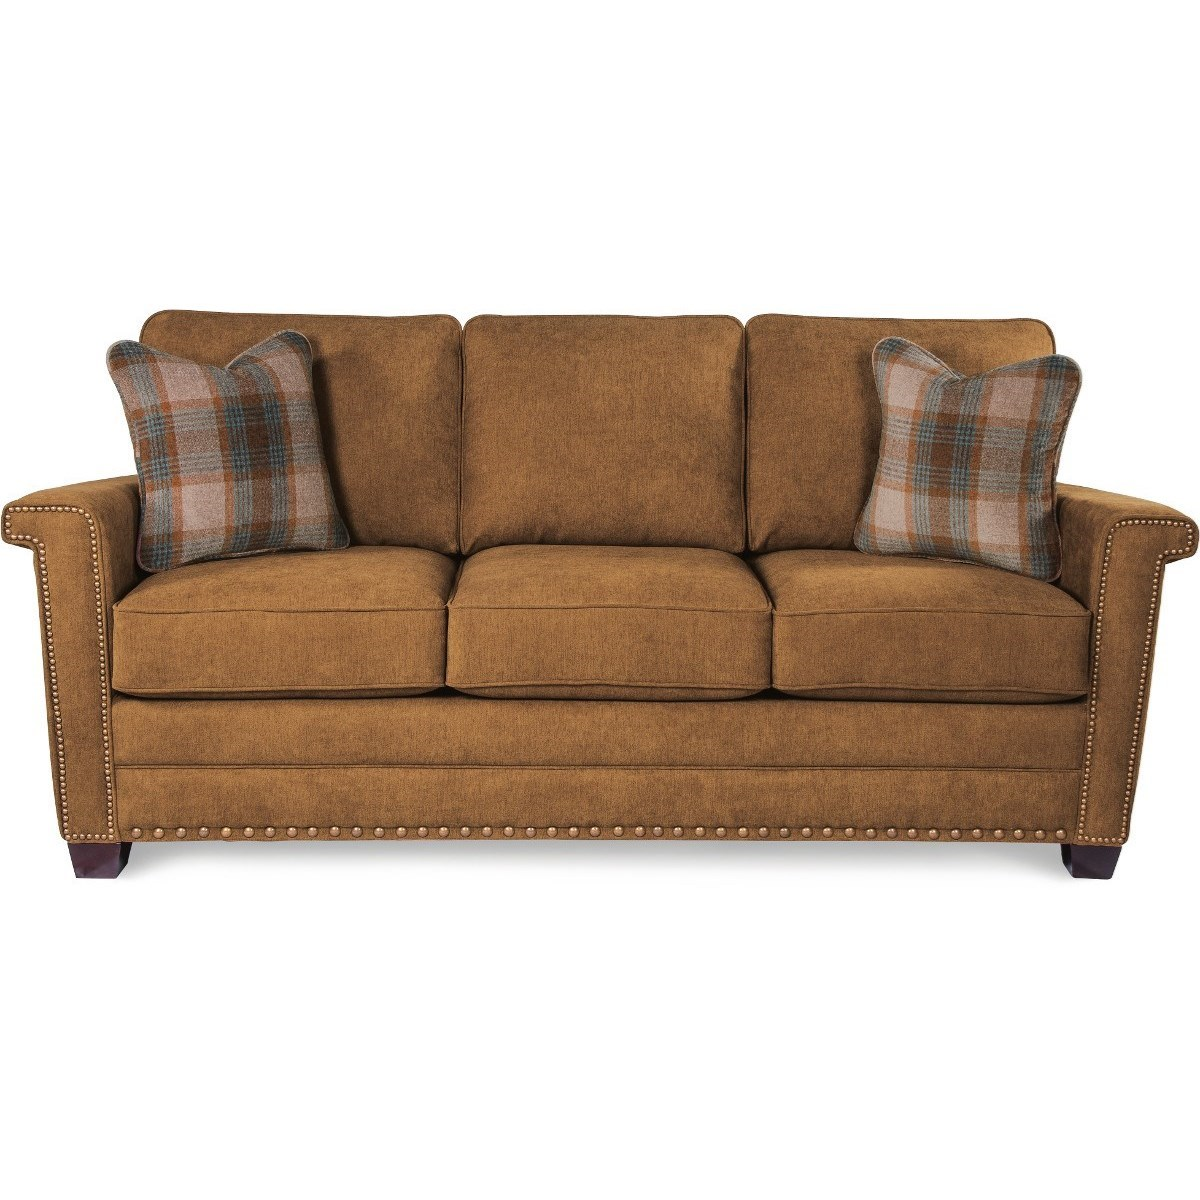 Bexley Sofa by La-Z-Boy at H.L. Stephens